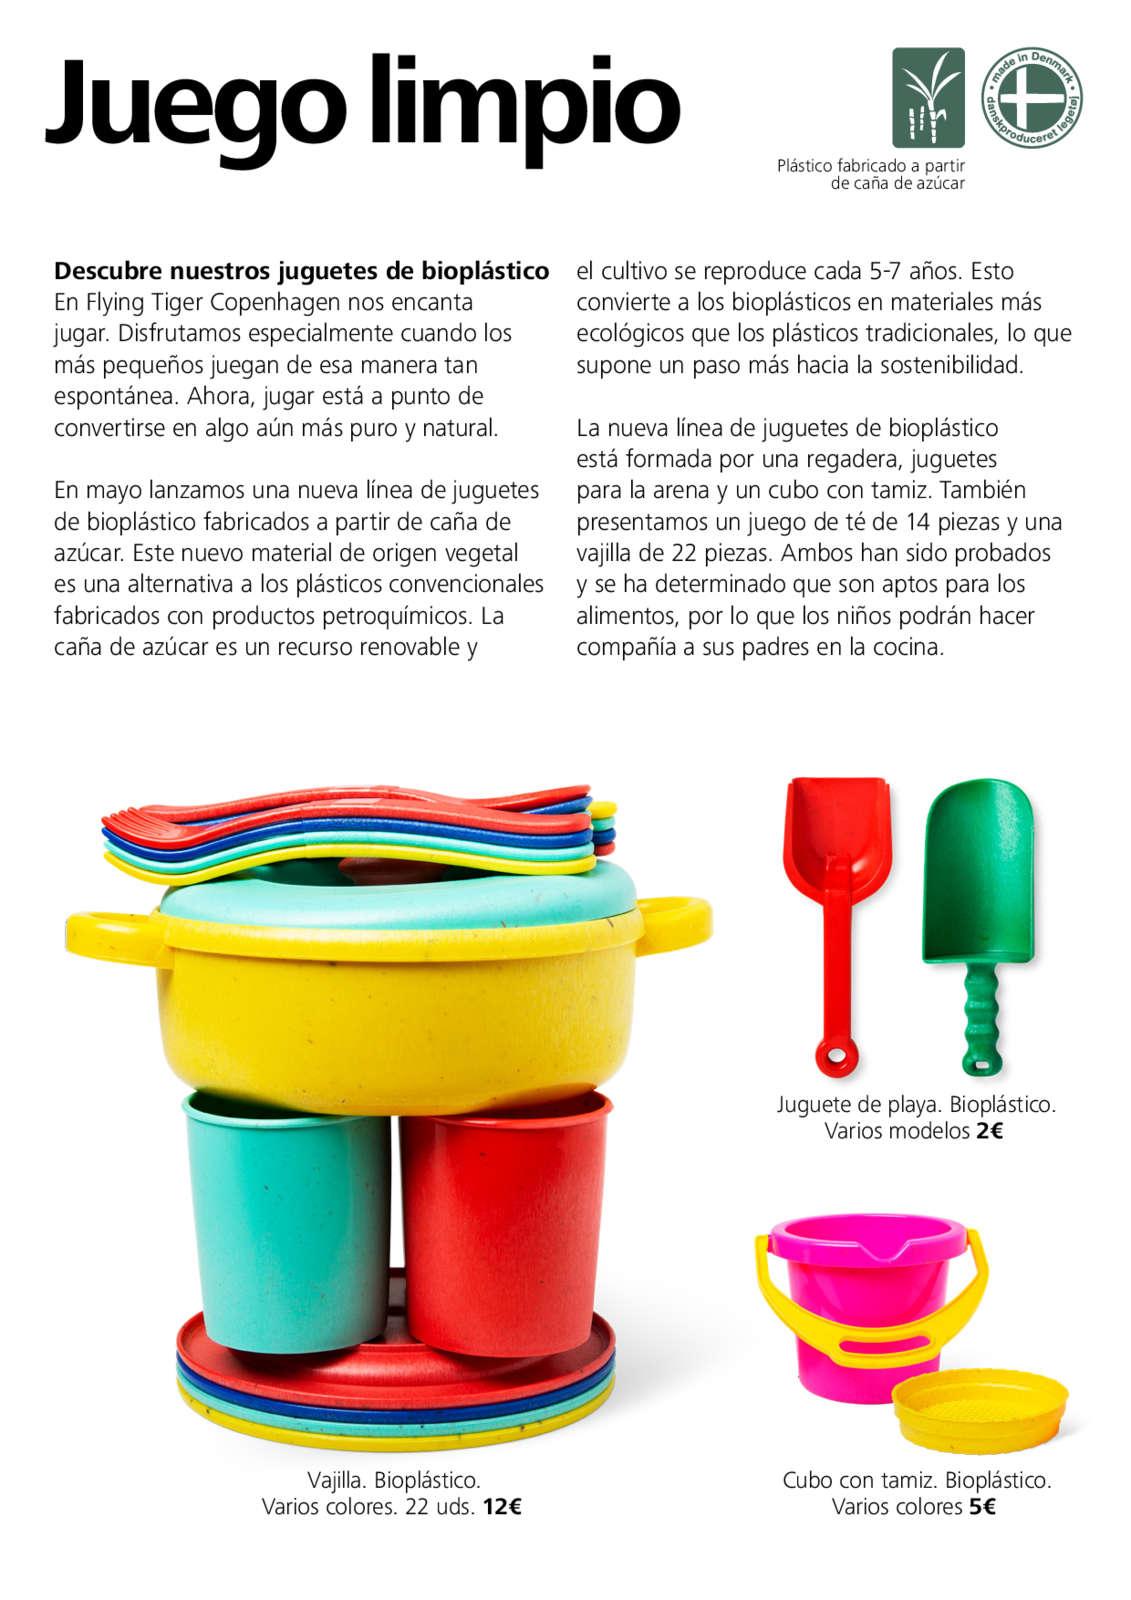 Comprar Exterior En Ofertia De Juguetes Valencia Barato f6yb7g